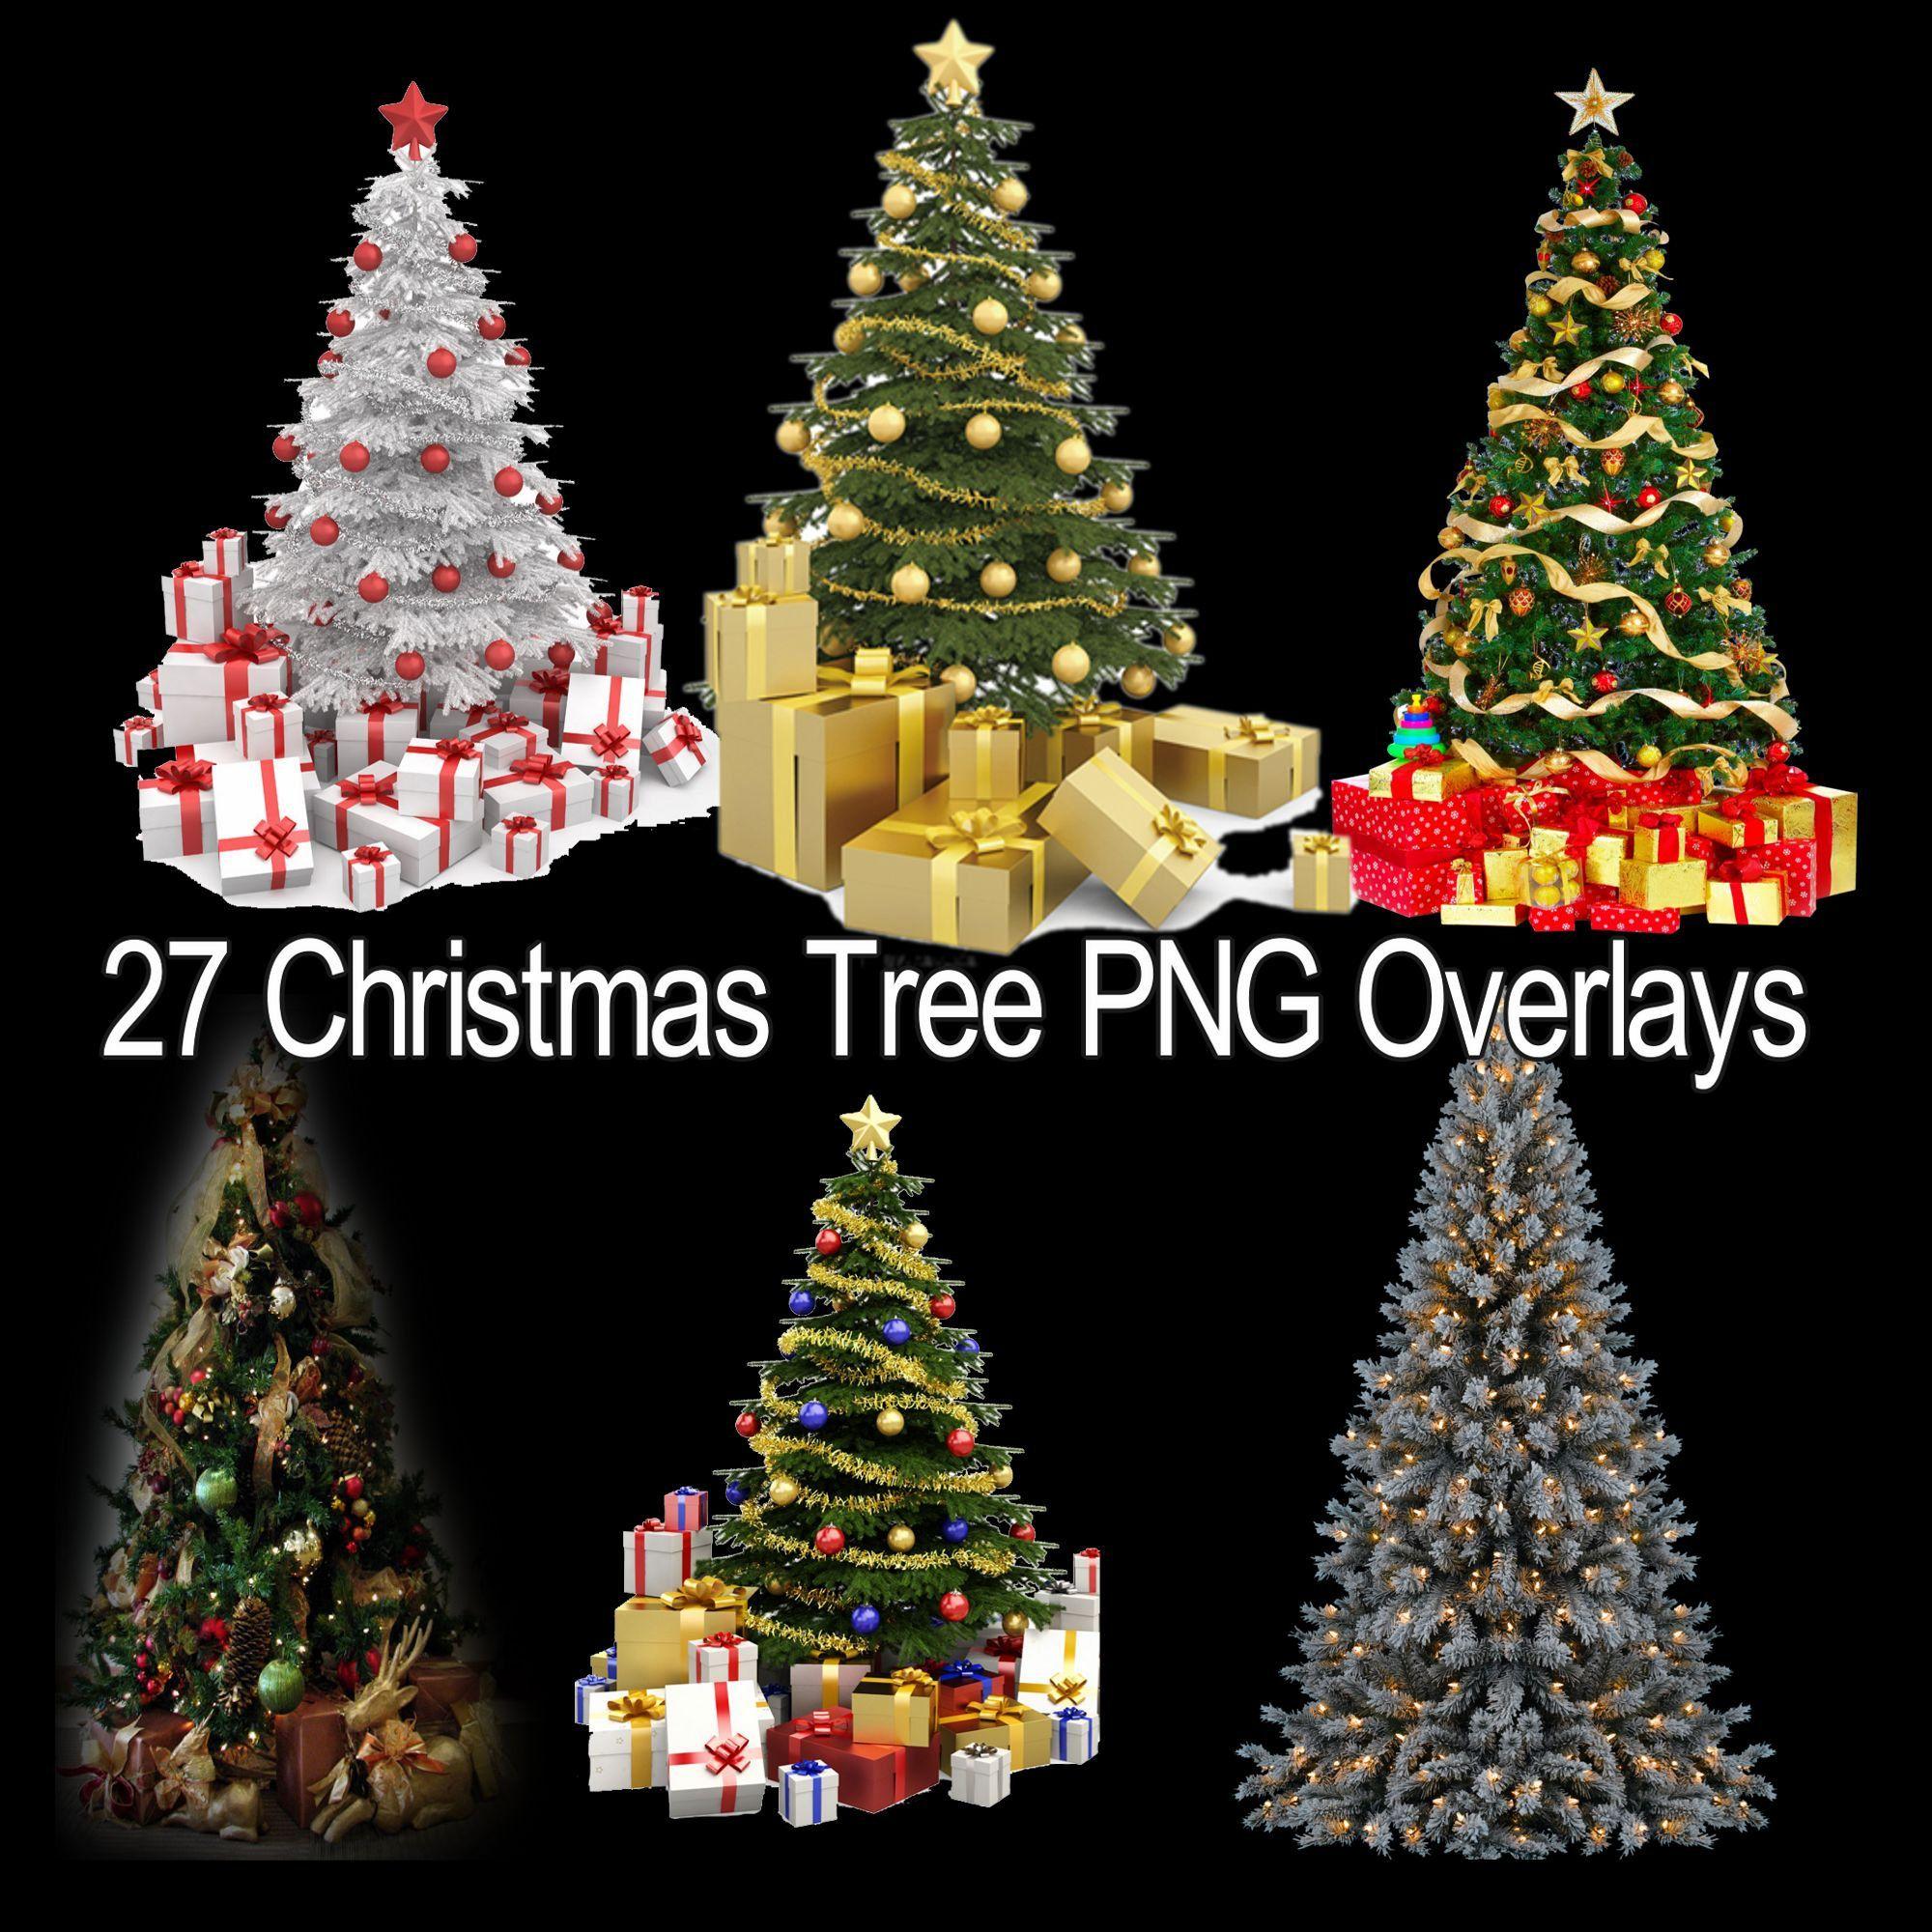 Christmas Tree Photoshop Overlays Christmas Tree Christmas Etsy Tree Photoshop Photoshop Overlays Overlays Transparent